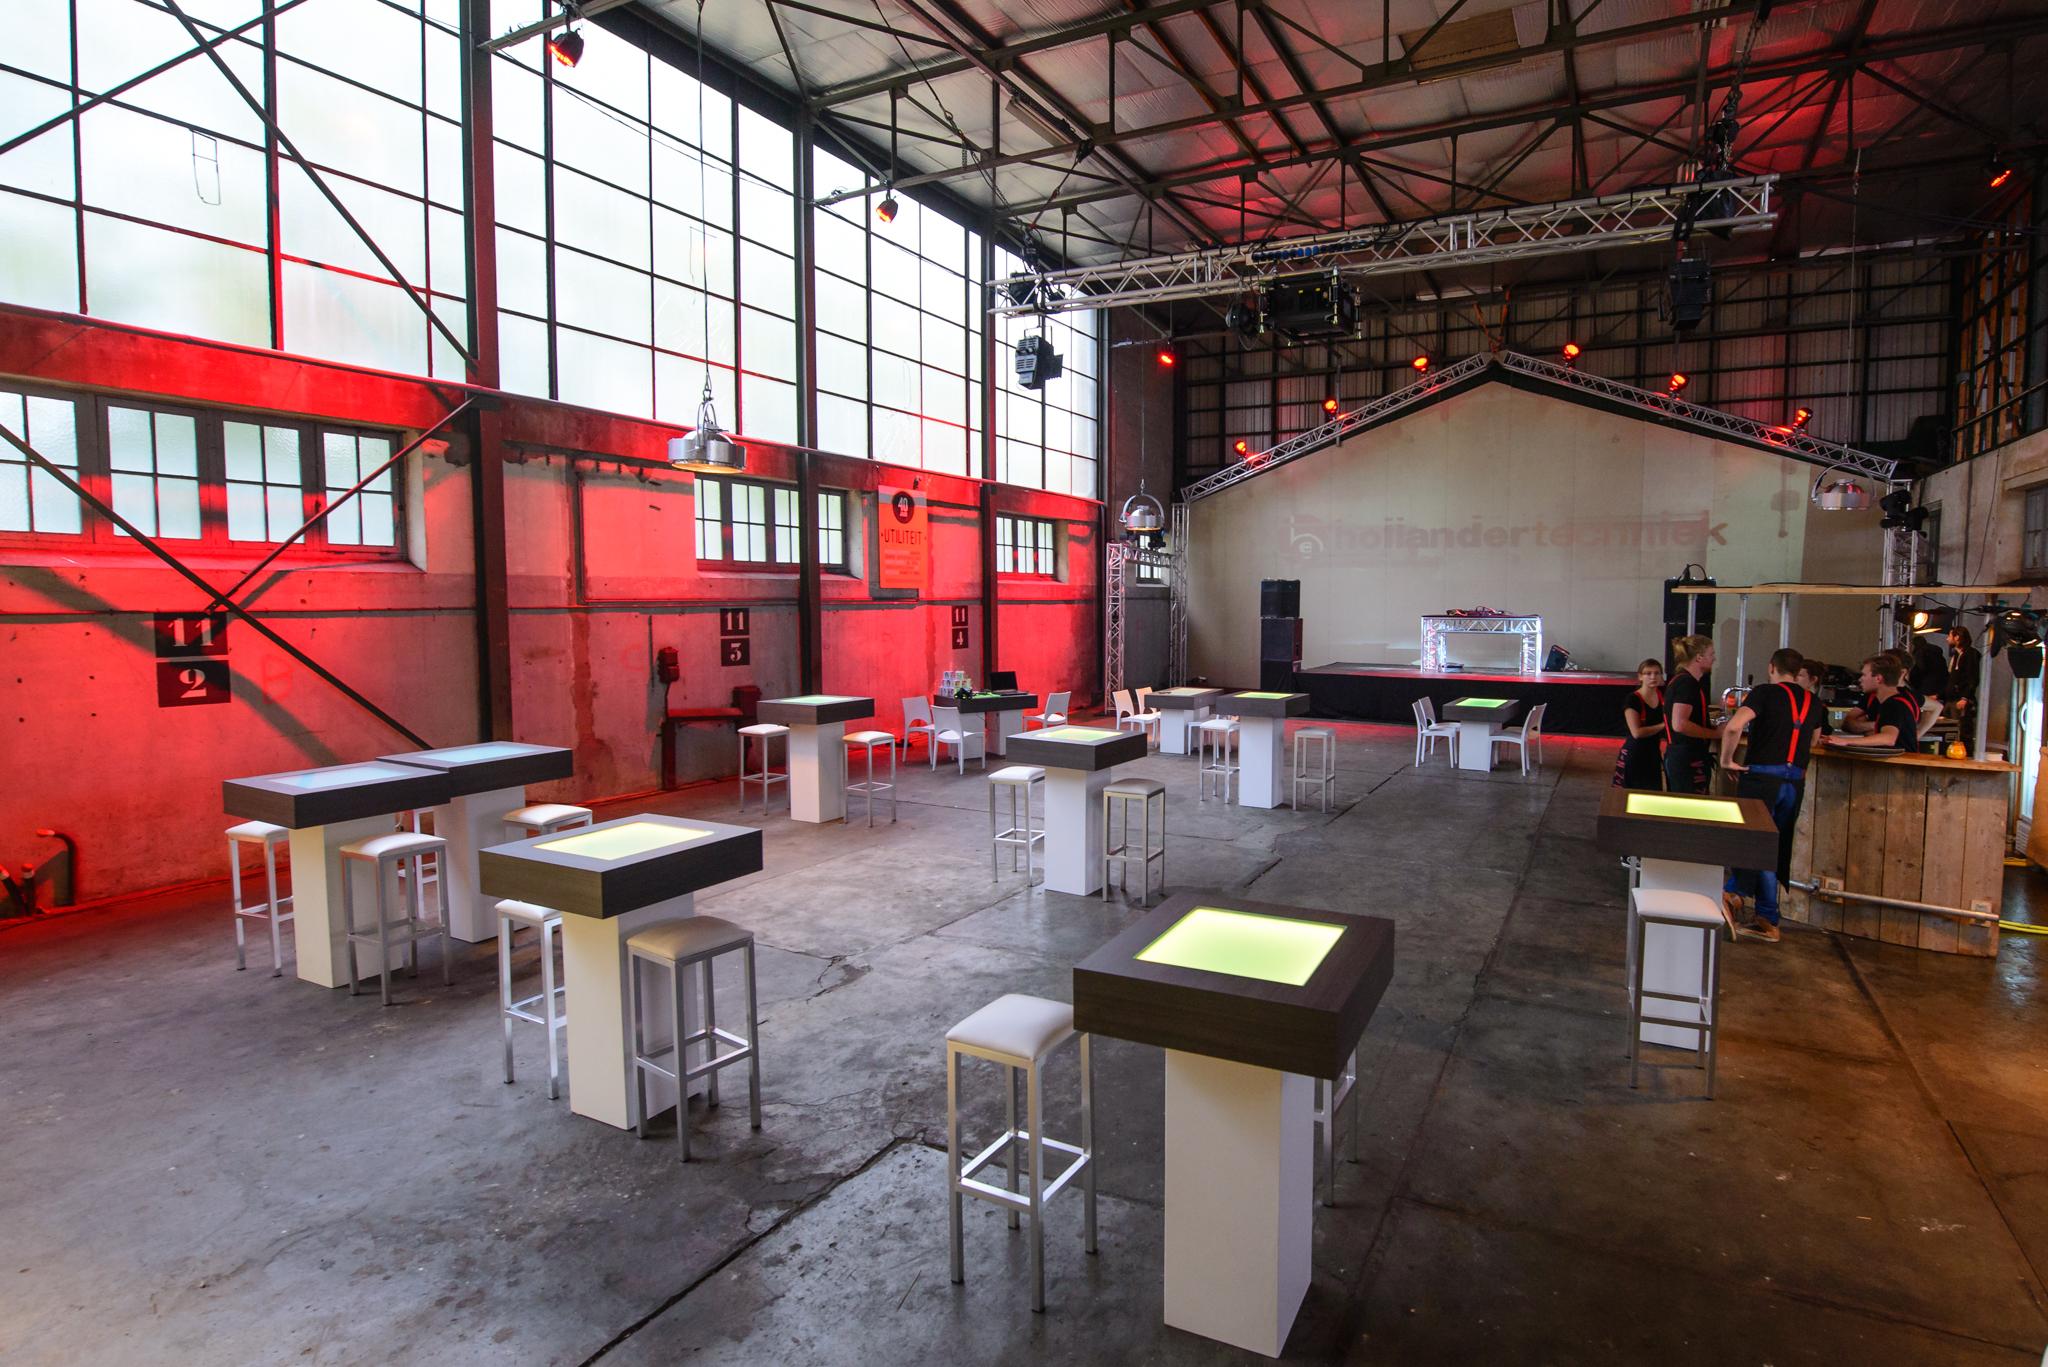 Sta Tafel Huren : Statafel led huren tebe tébé evenementen service